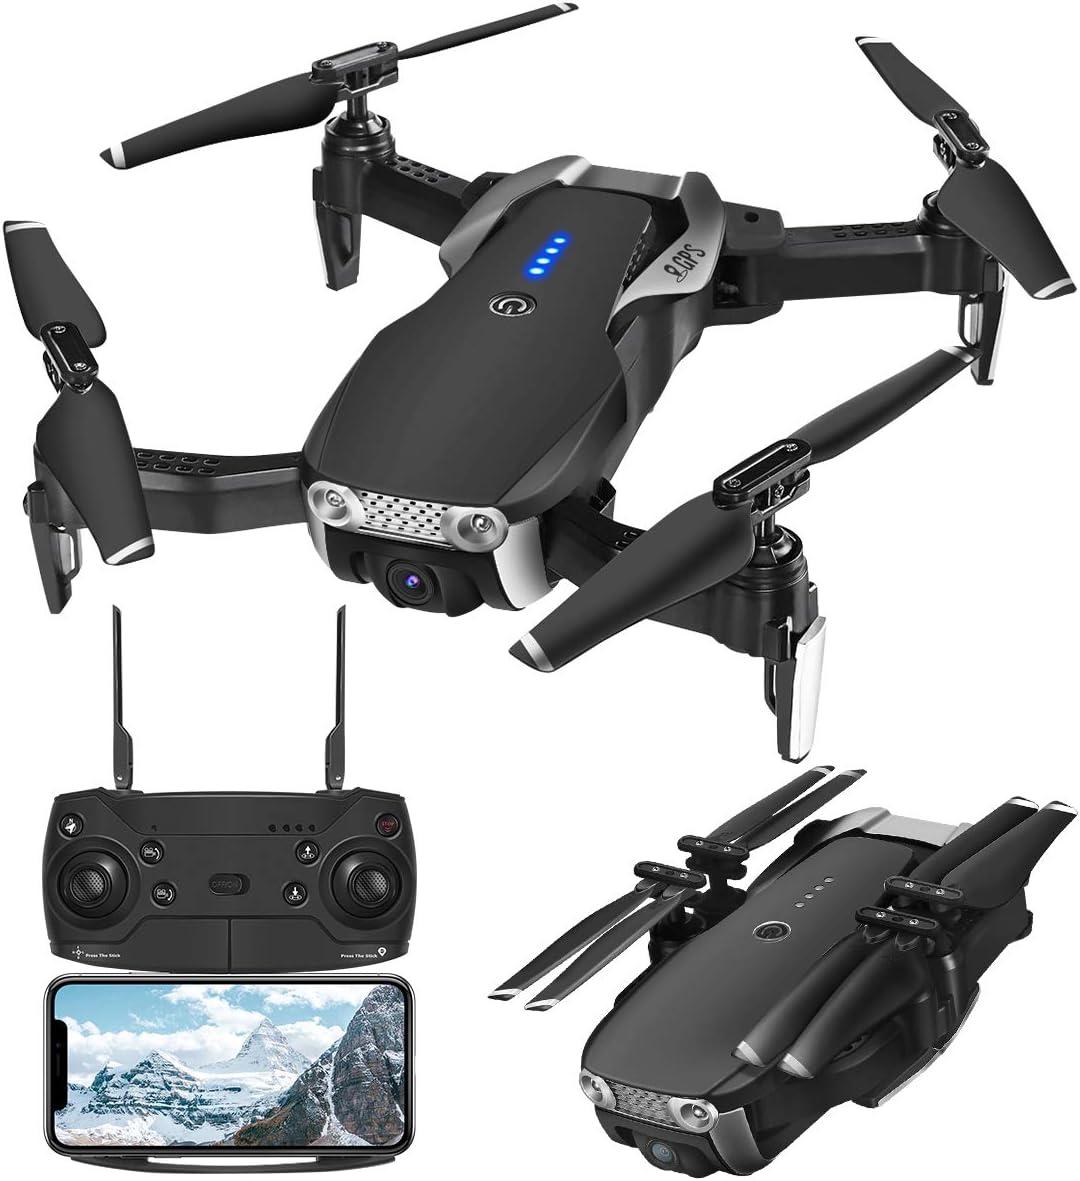 Eachine e511s GPS 1080p FullHD Caméra Wifi